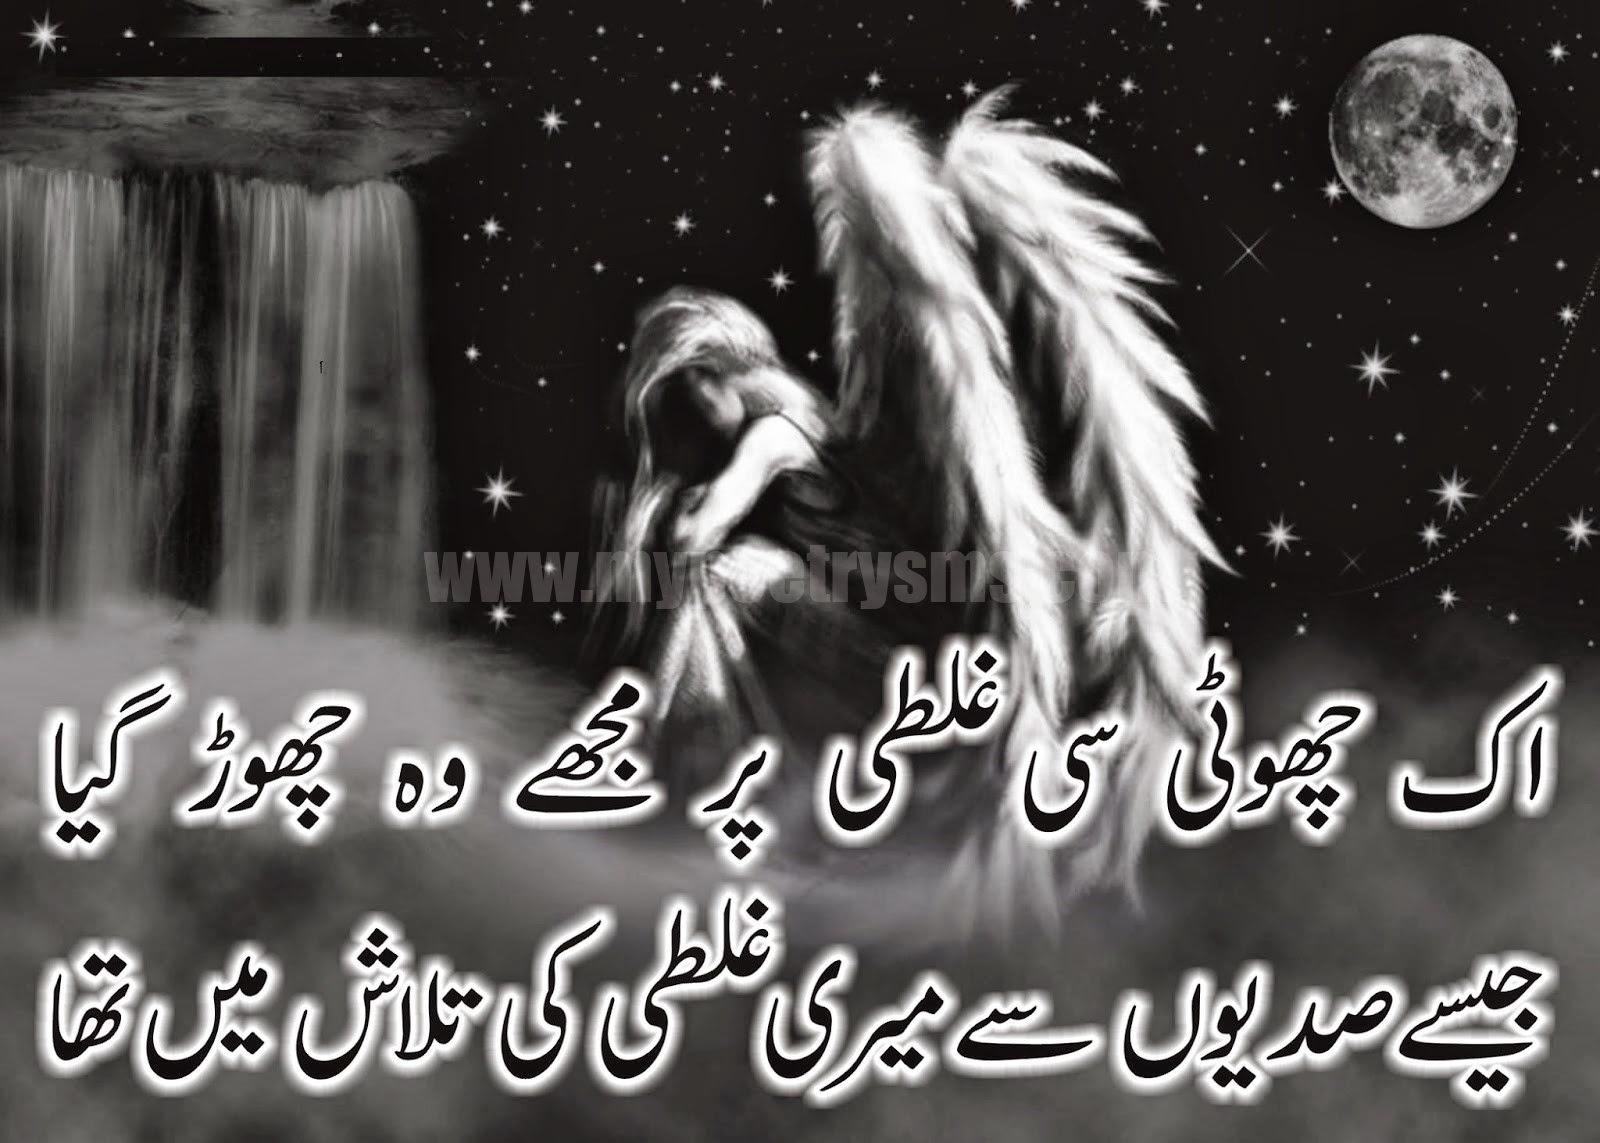 Dard e Tanhai Shayari Urdu Urdu Poetry Dard e Dil